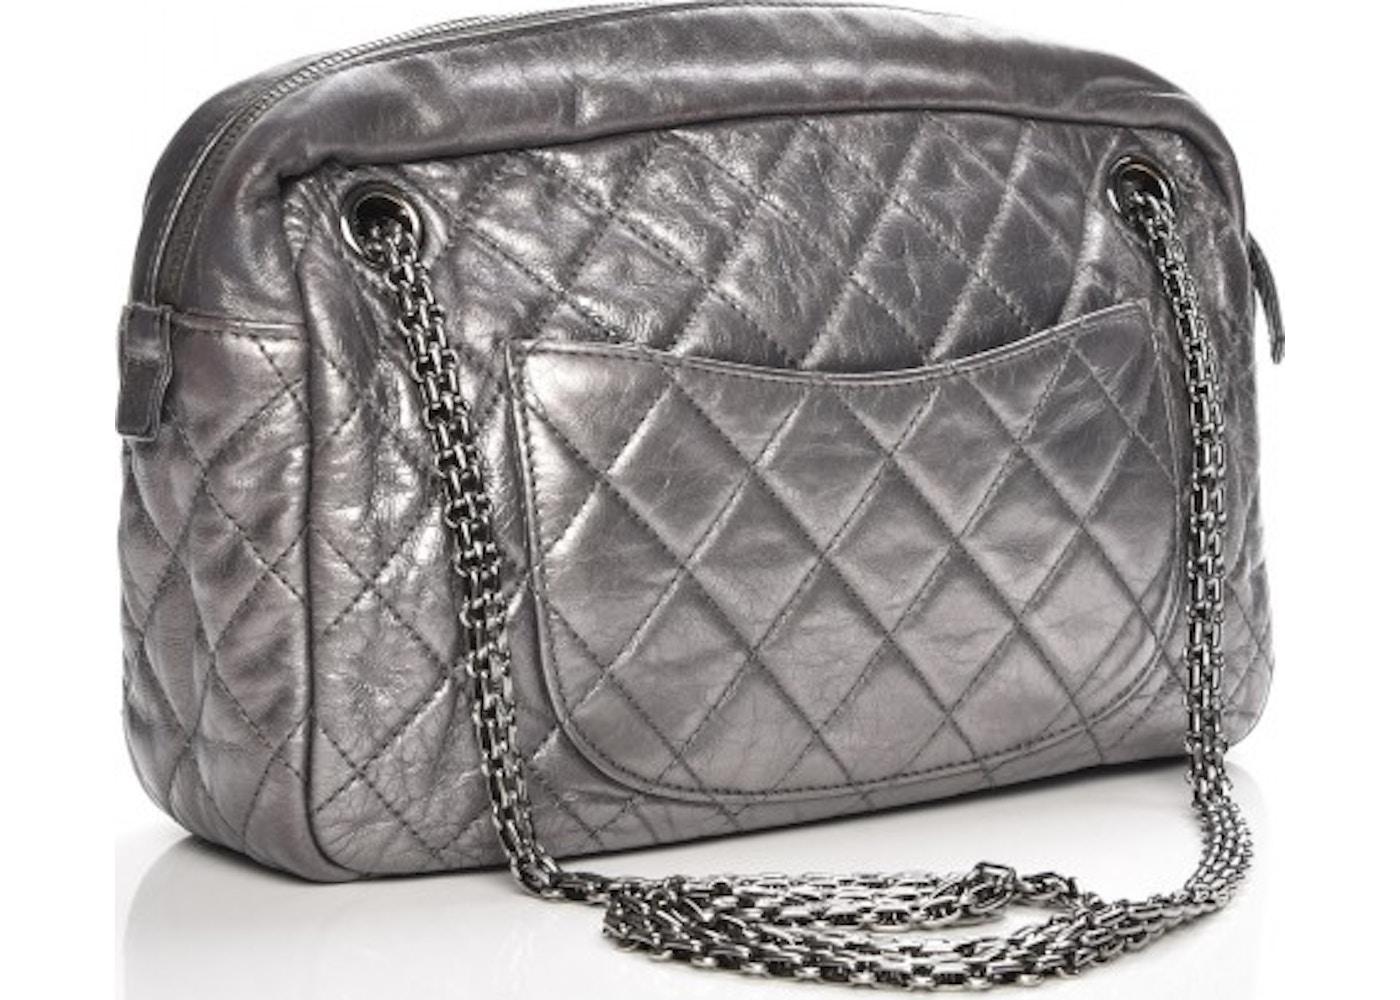 df982fc47112 Chanel Reissue Camera Case Quilted Diamond Metallic Medium Dark Silver